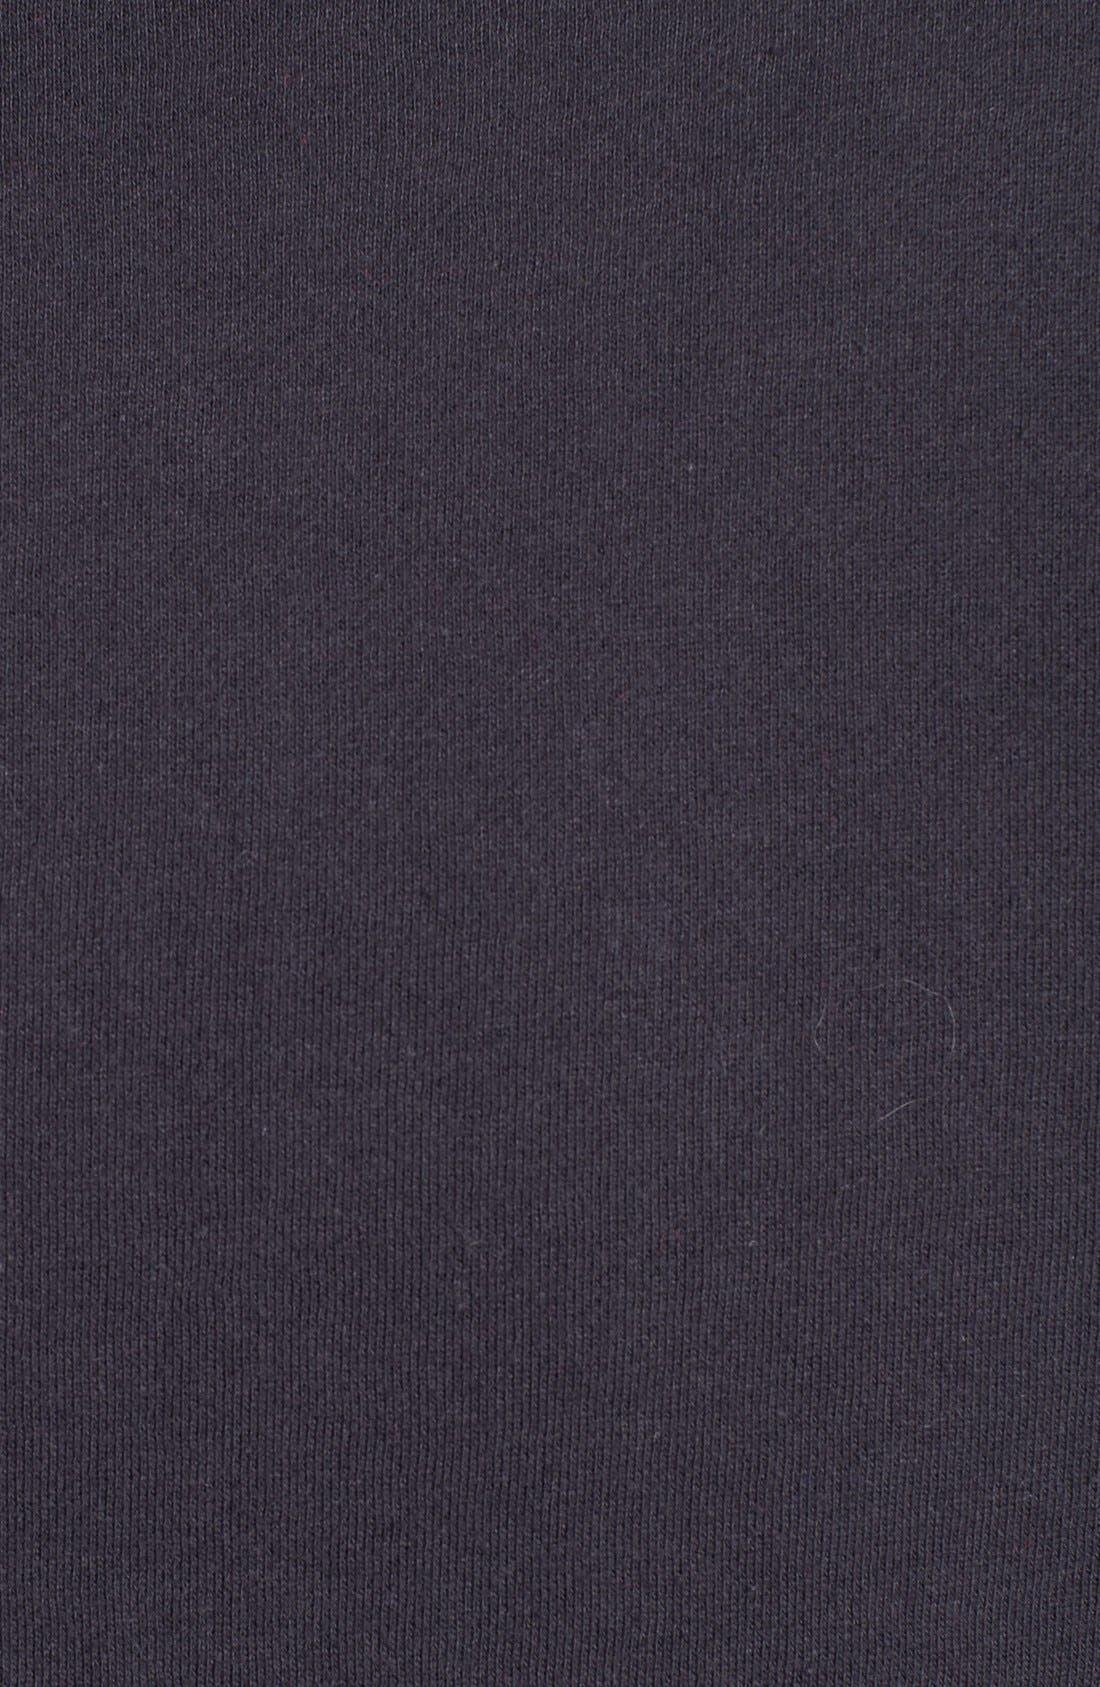 Alternate Image 3  - Mitchell & Ness 'Portland Trail Blazers - Technical Foul' Sweatshirt